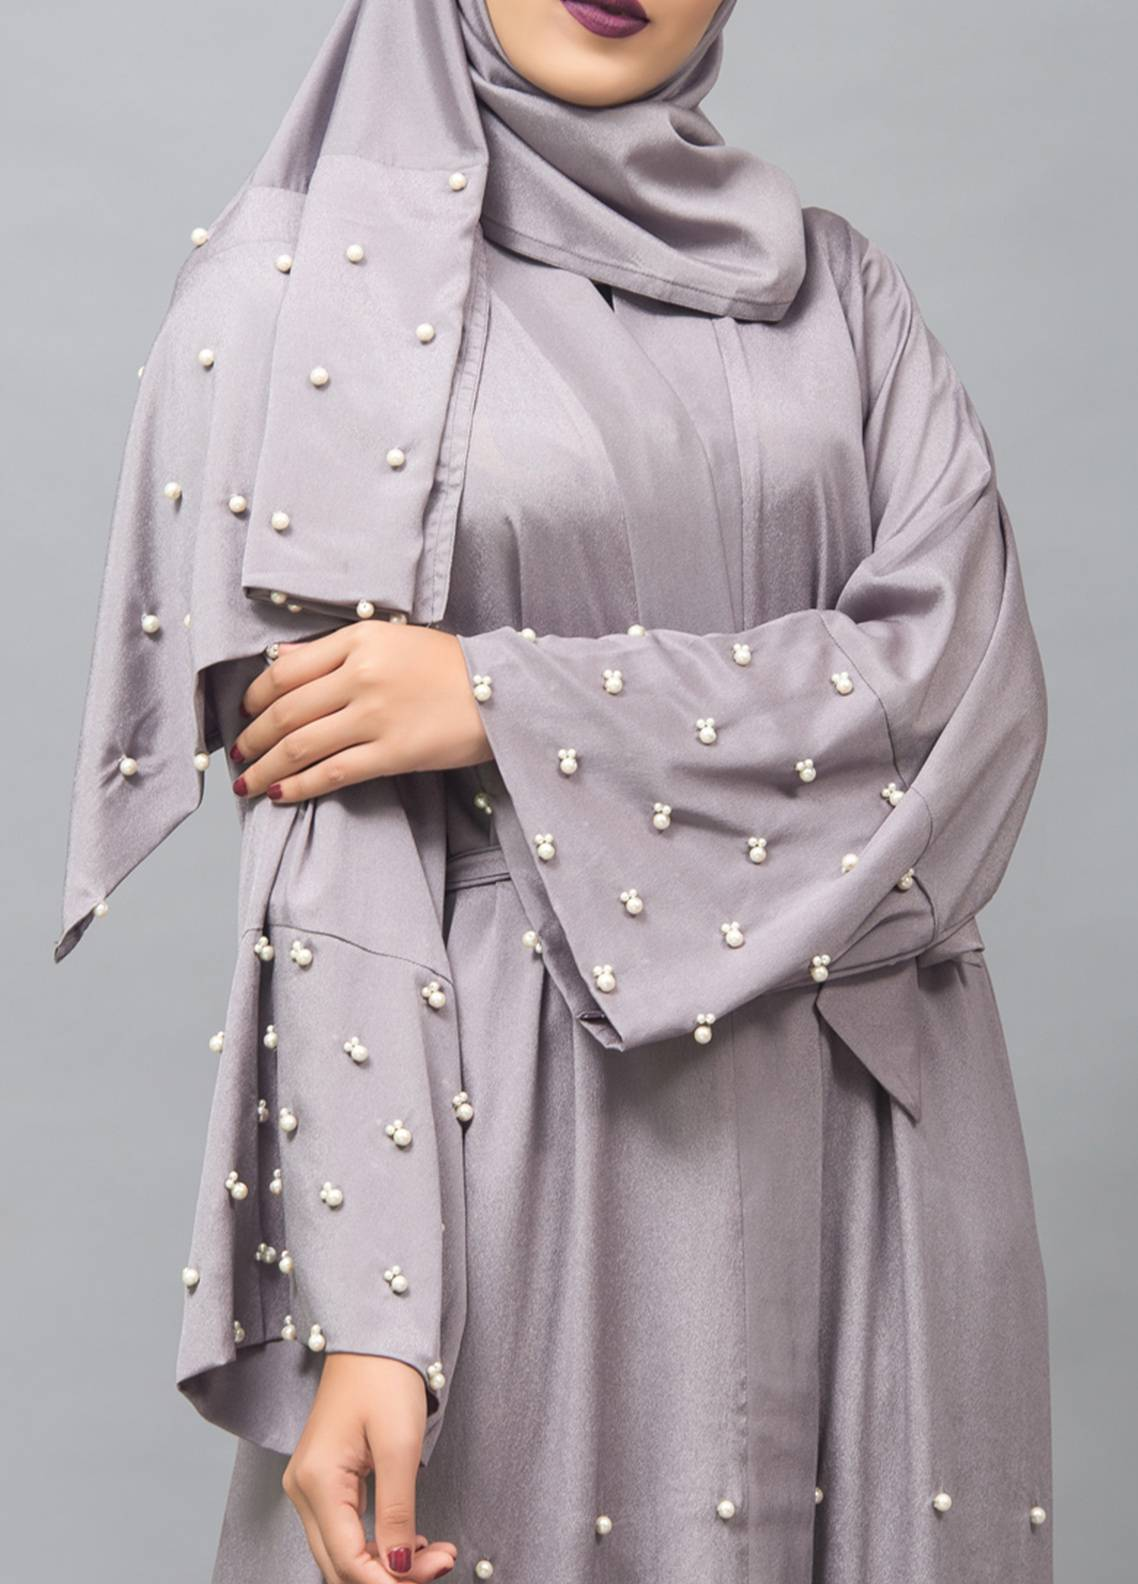 Hijab ul Hareem Front Open Style Stitched Abaya 0116-J-999